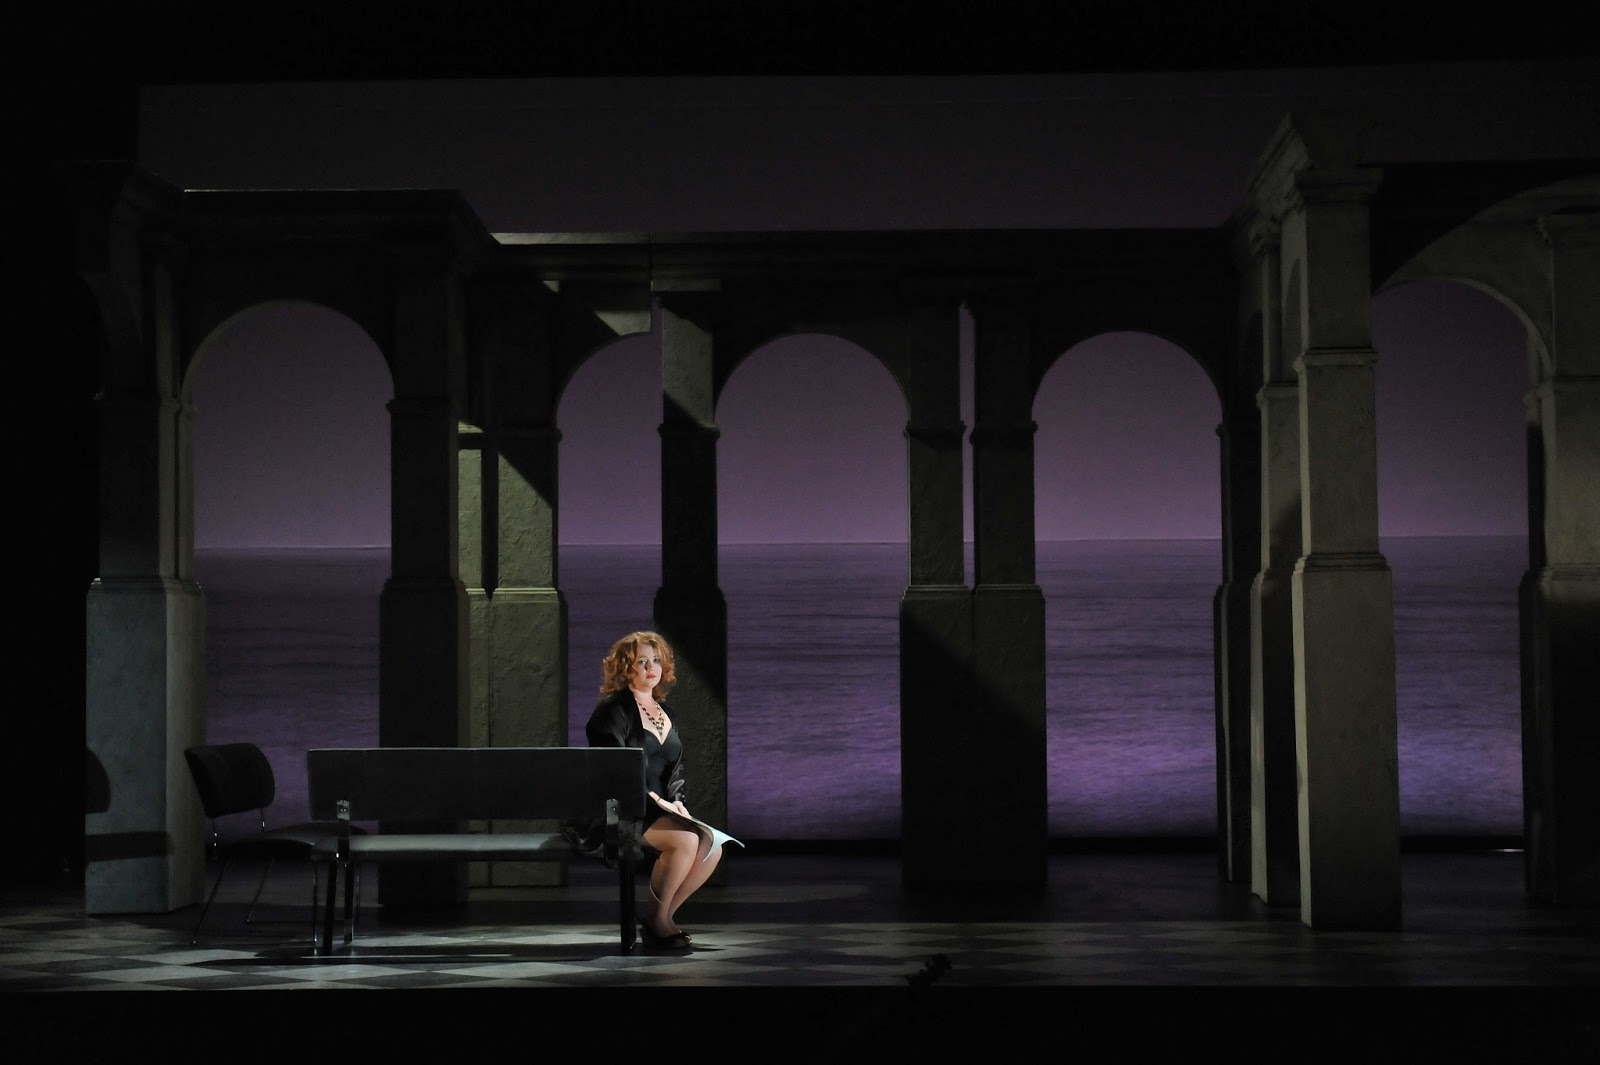 Hannah Sandison as Rosemene in Paul Curran's production of Handel's Imeneo at the London Handel Festival, 2013. Photo credit Chris Christodoulou